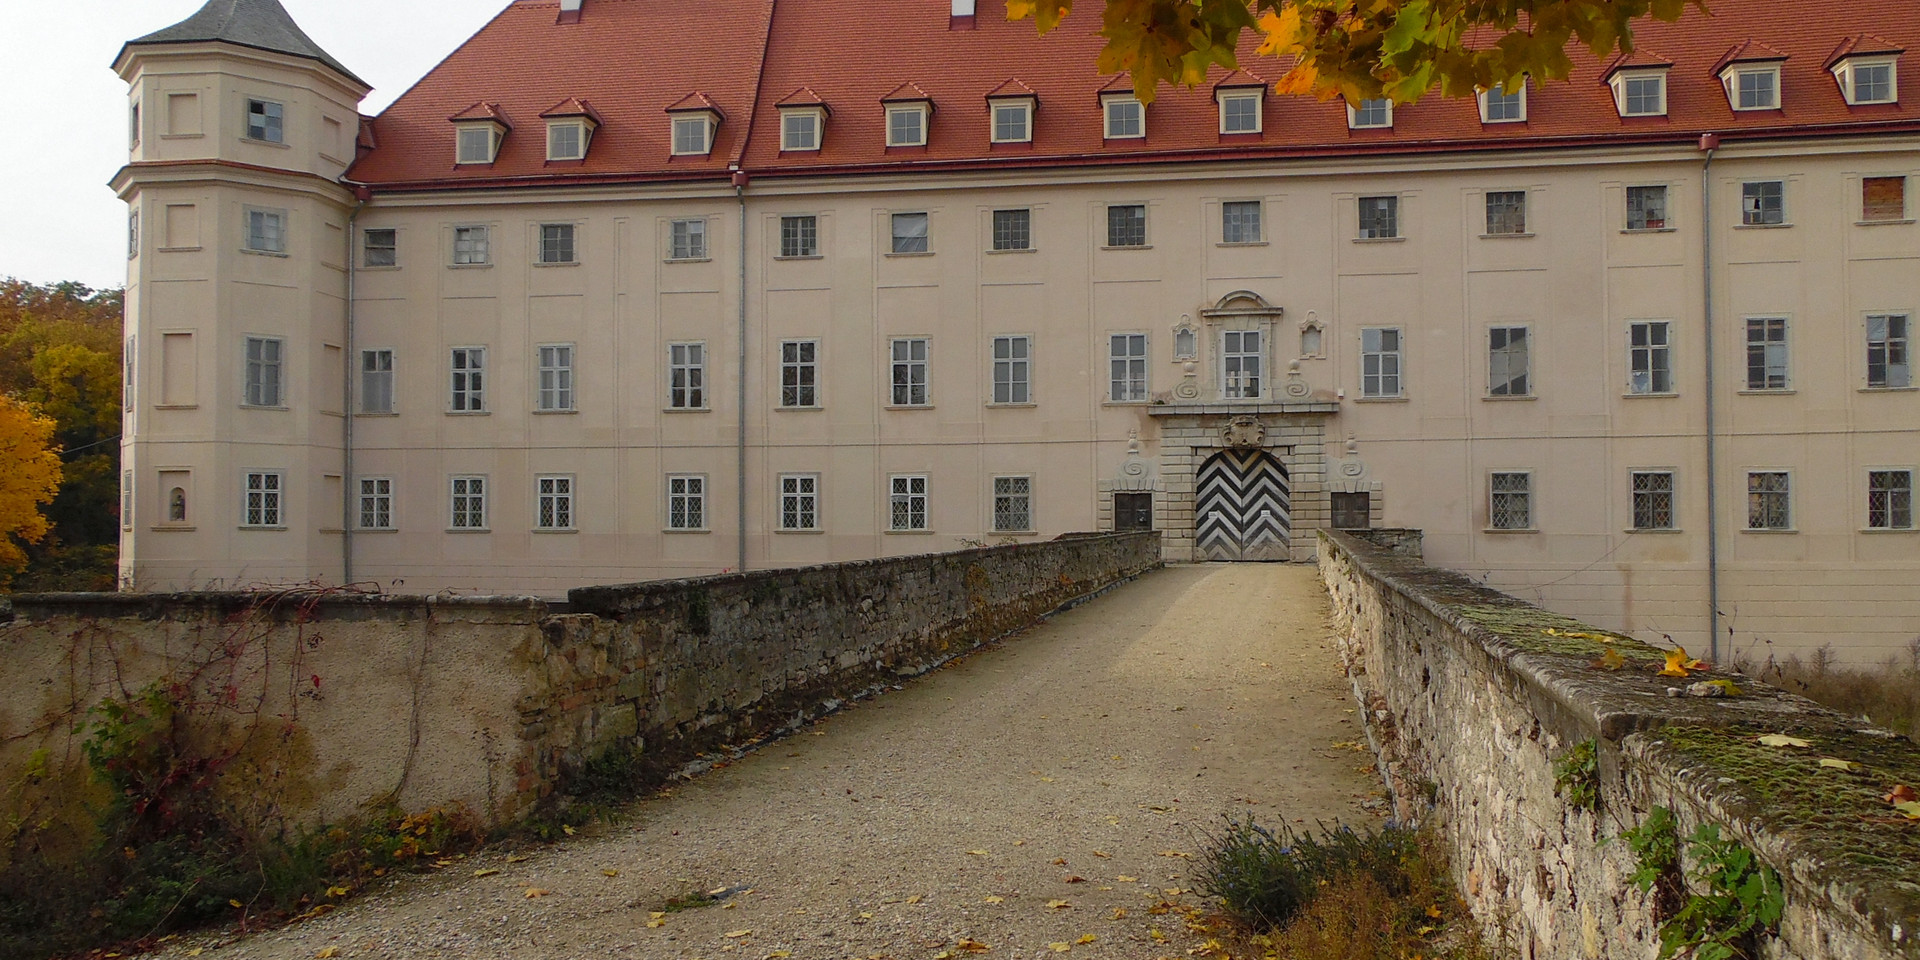 Petronell castle (Austria, Day 4)